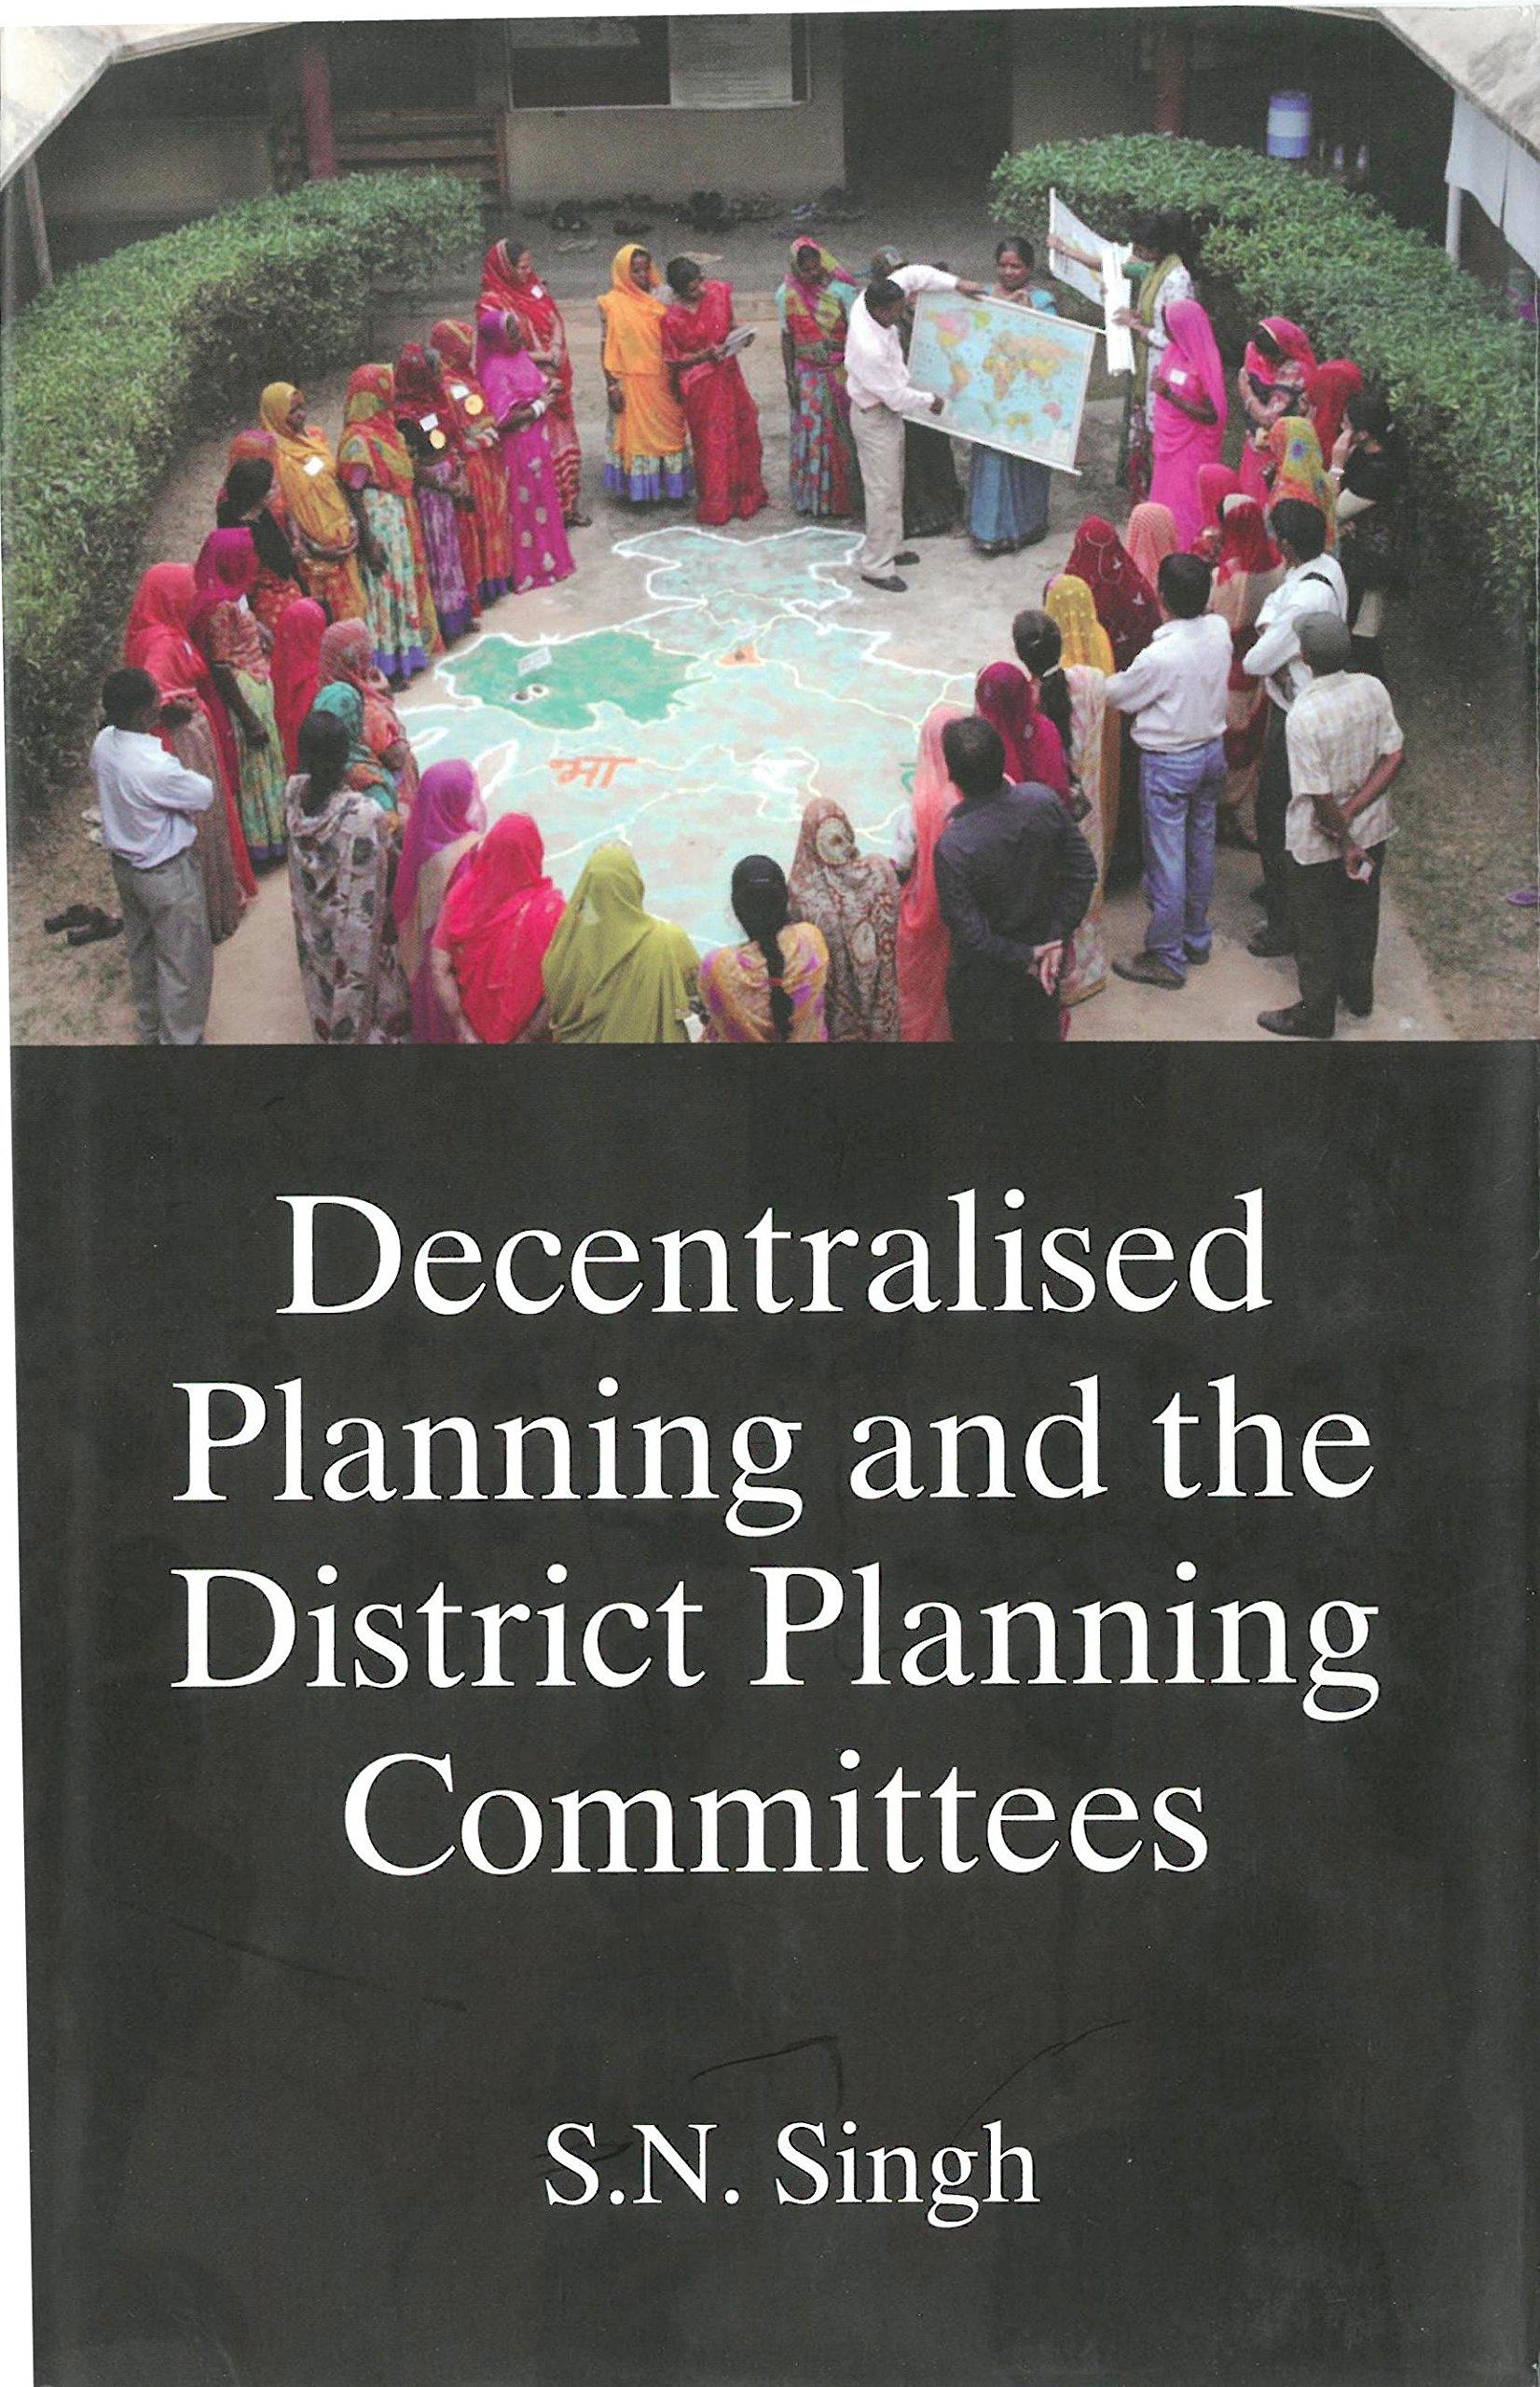 decentralised planning Video lession on decentralised planning, odisha state open university, sambalpur, odisha.